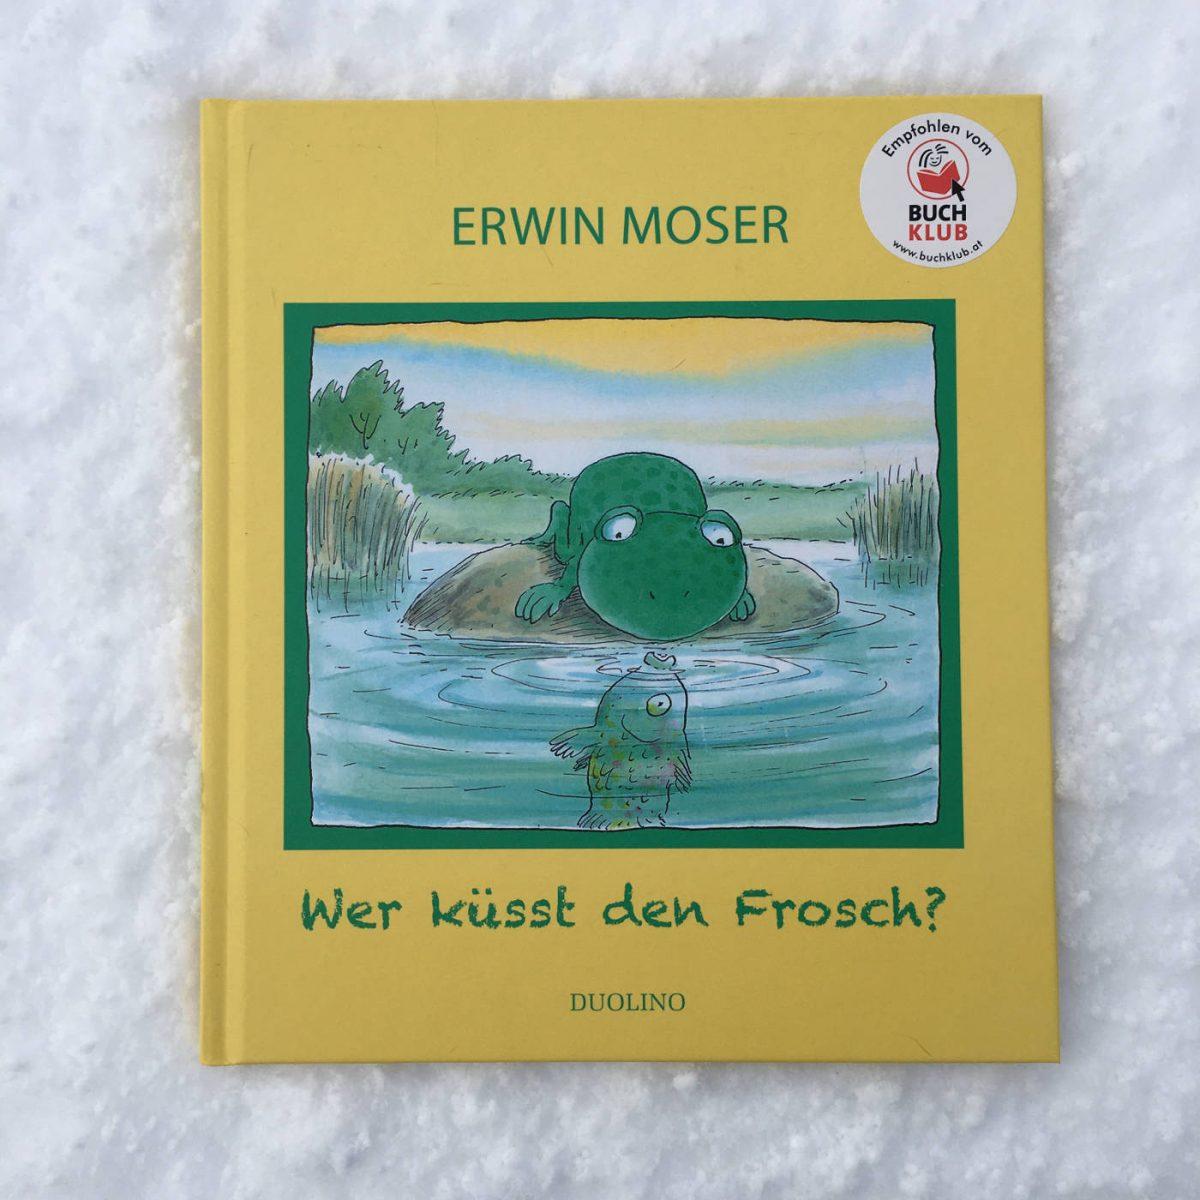 Erwin Moser: Wer küsst den Frosch?